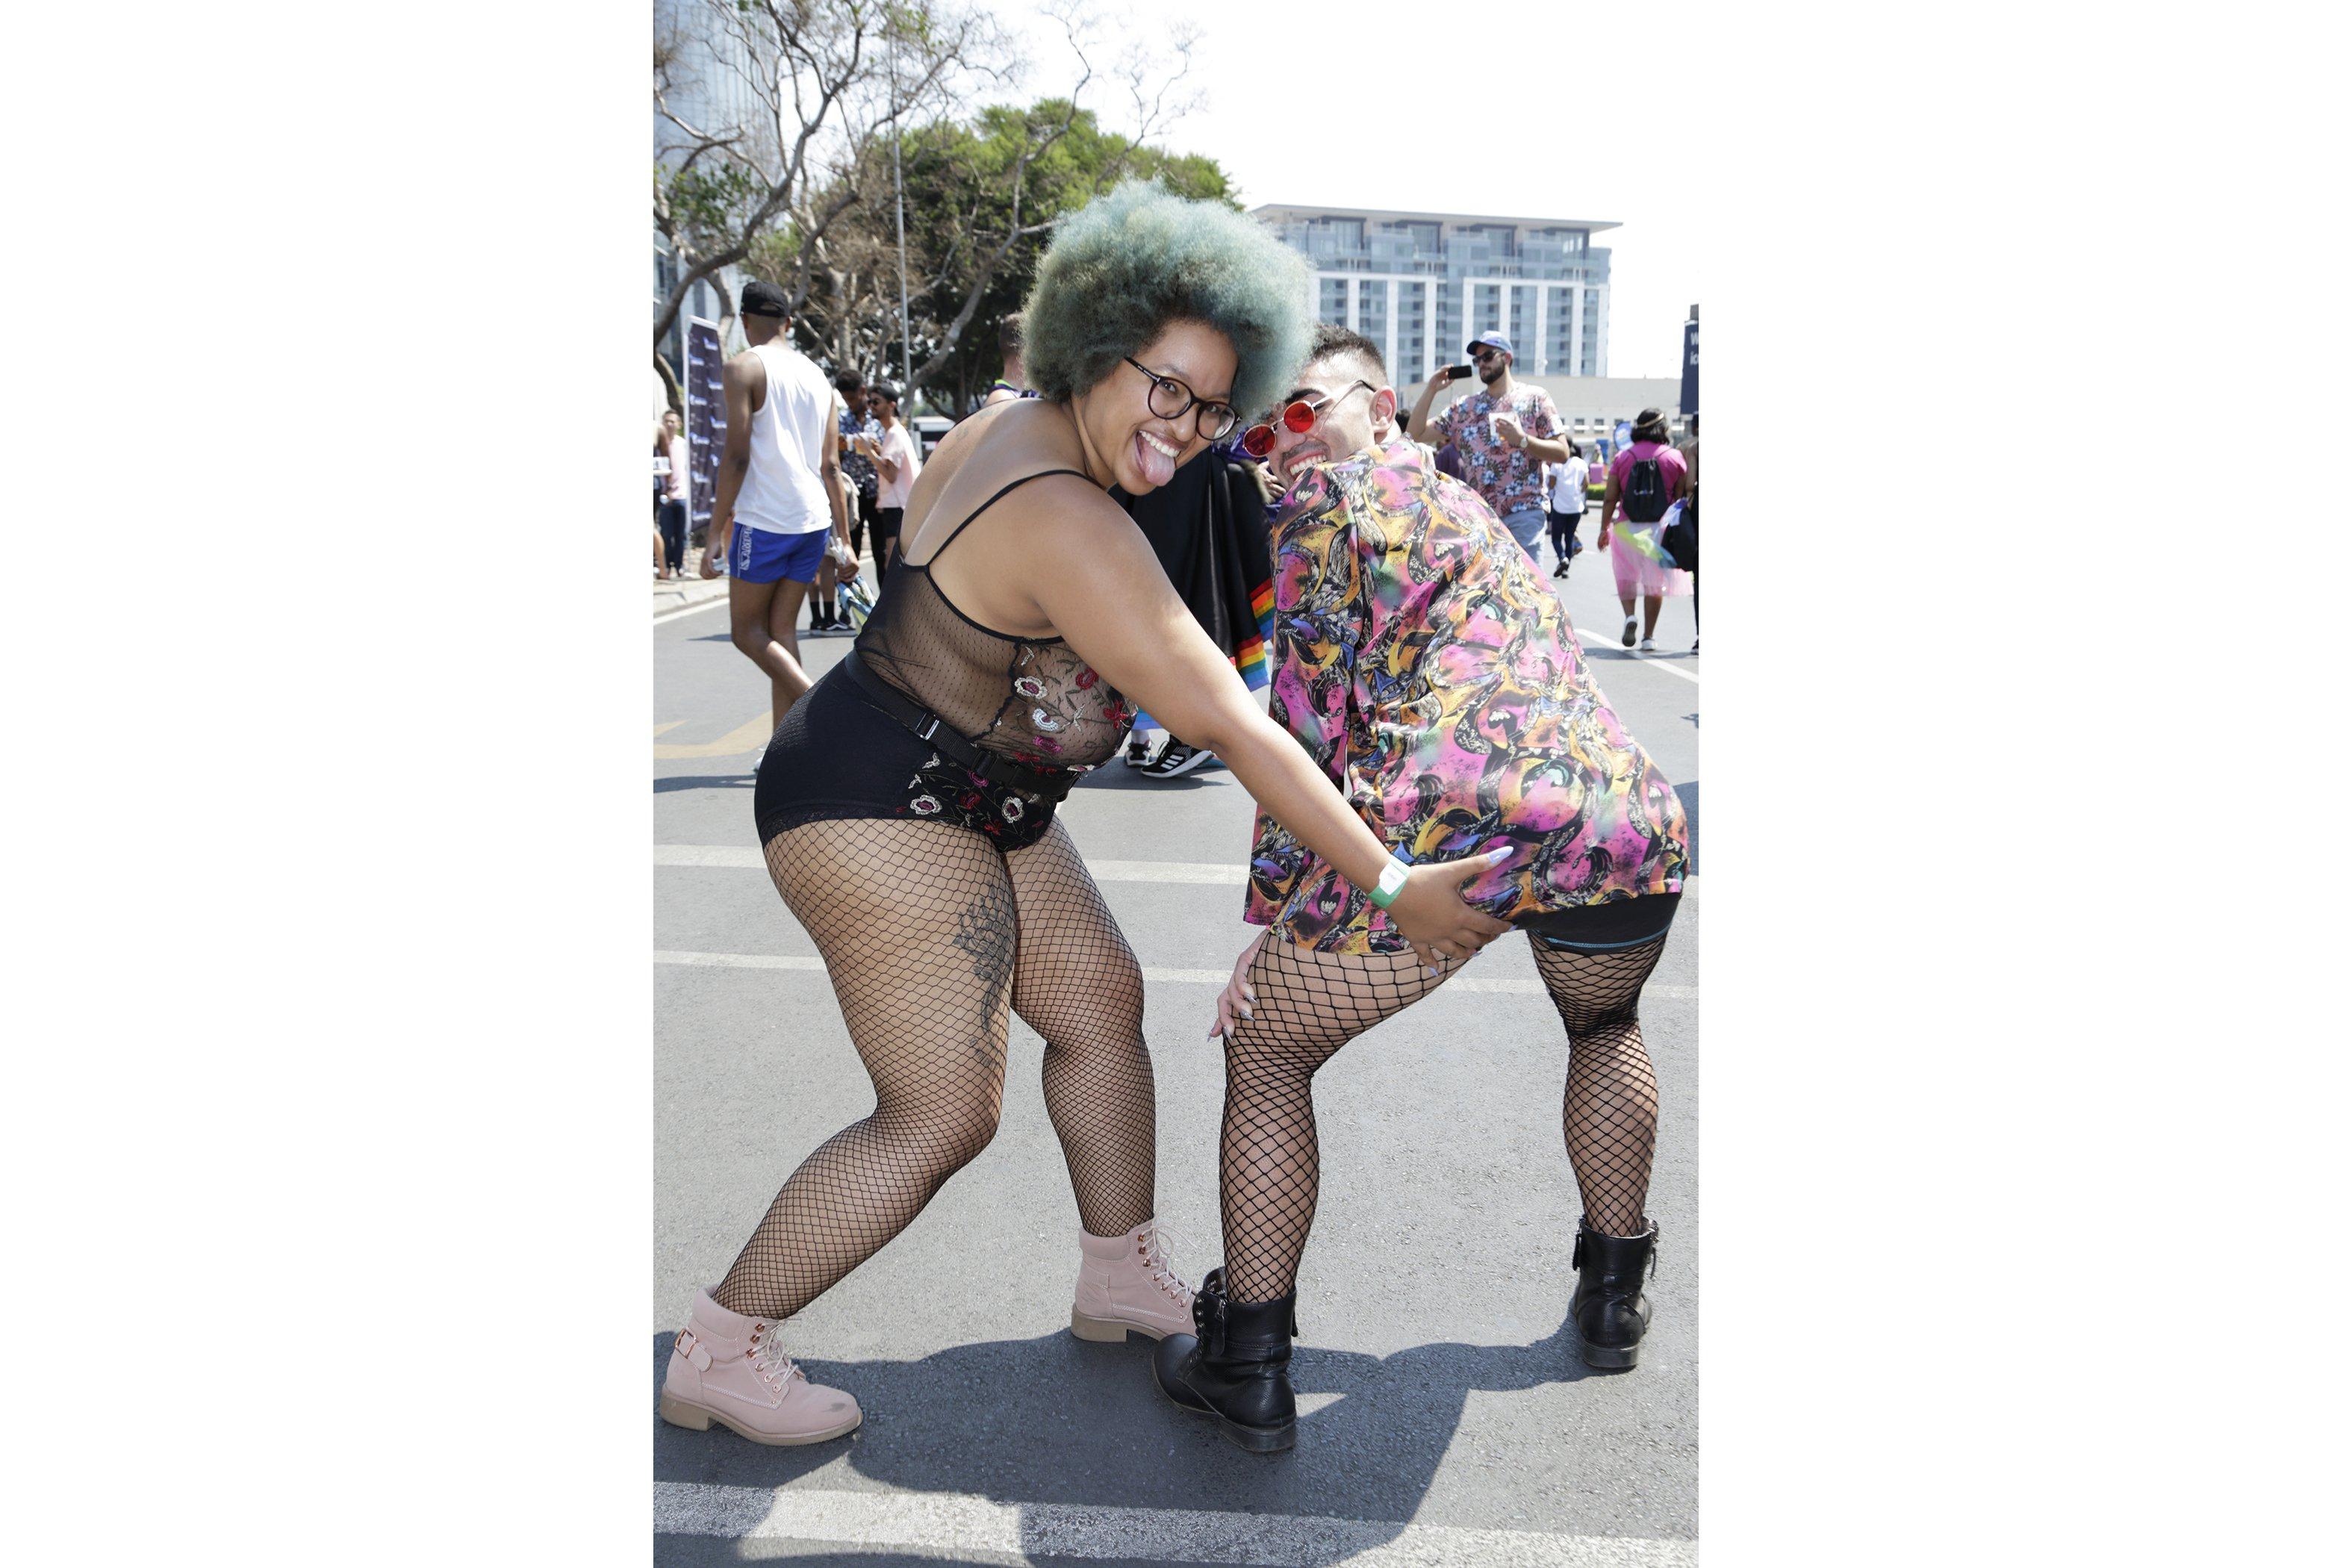 Johannesburg_Pride_LGBTQ_Noncedo Gxekwa_036.jpg